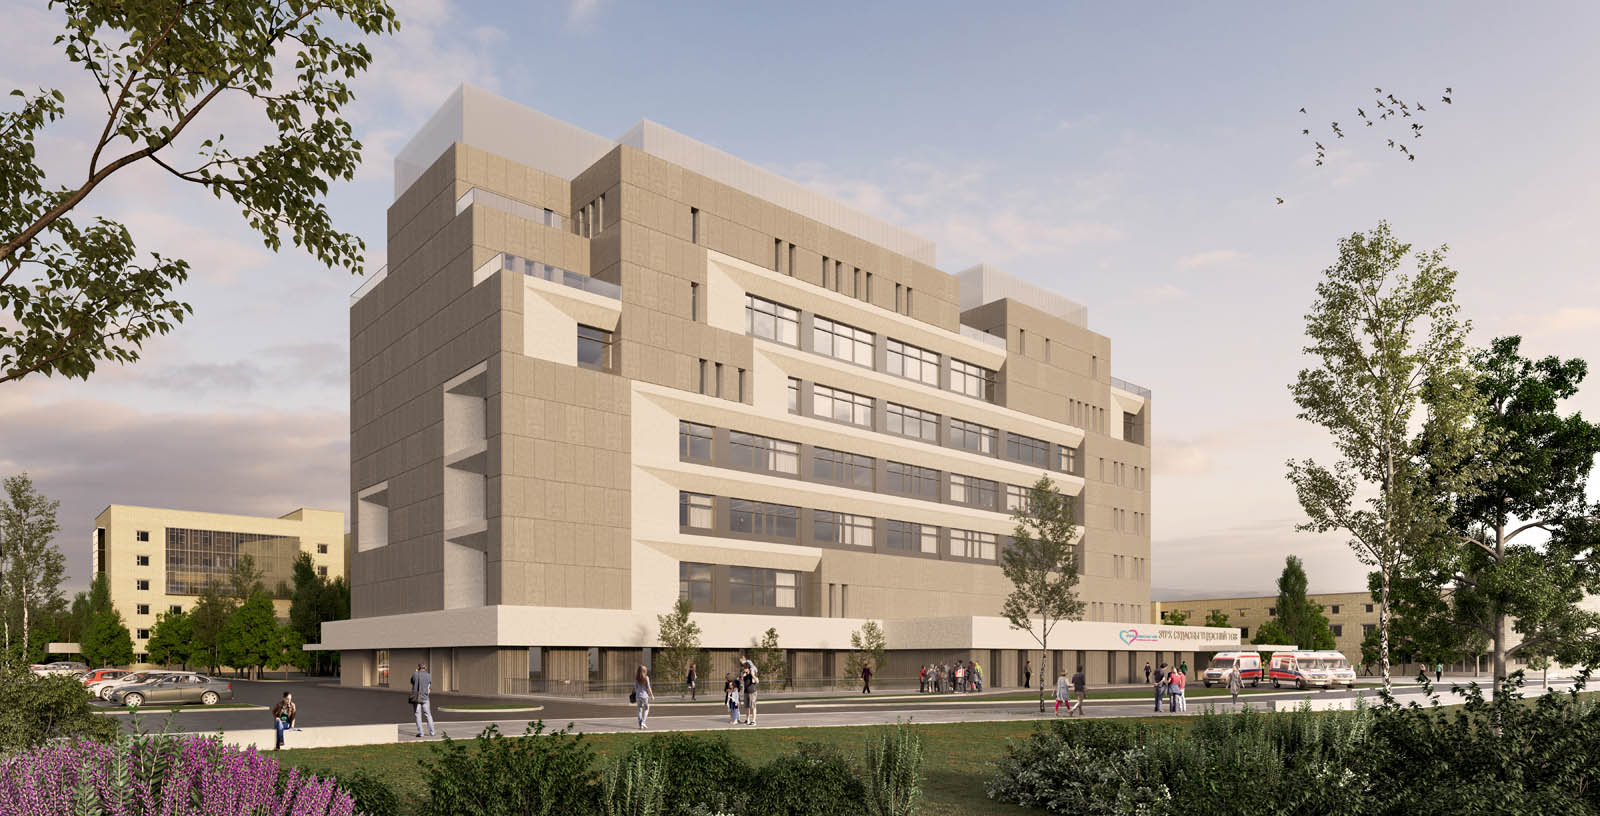 Mongolia_Hospital_02_Architecture_IDOM_1